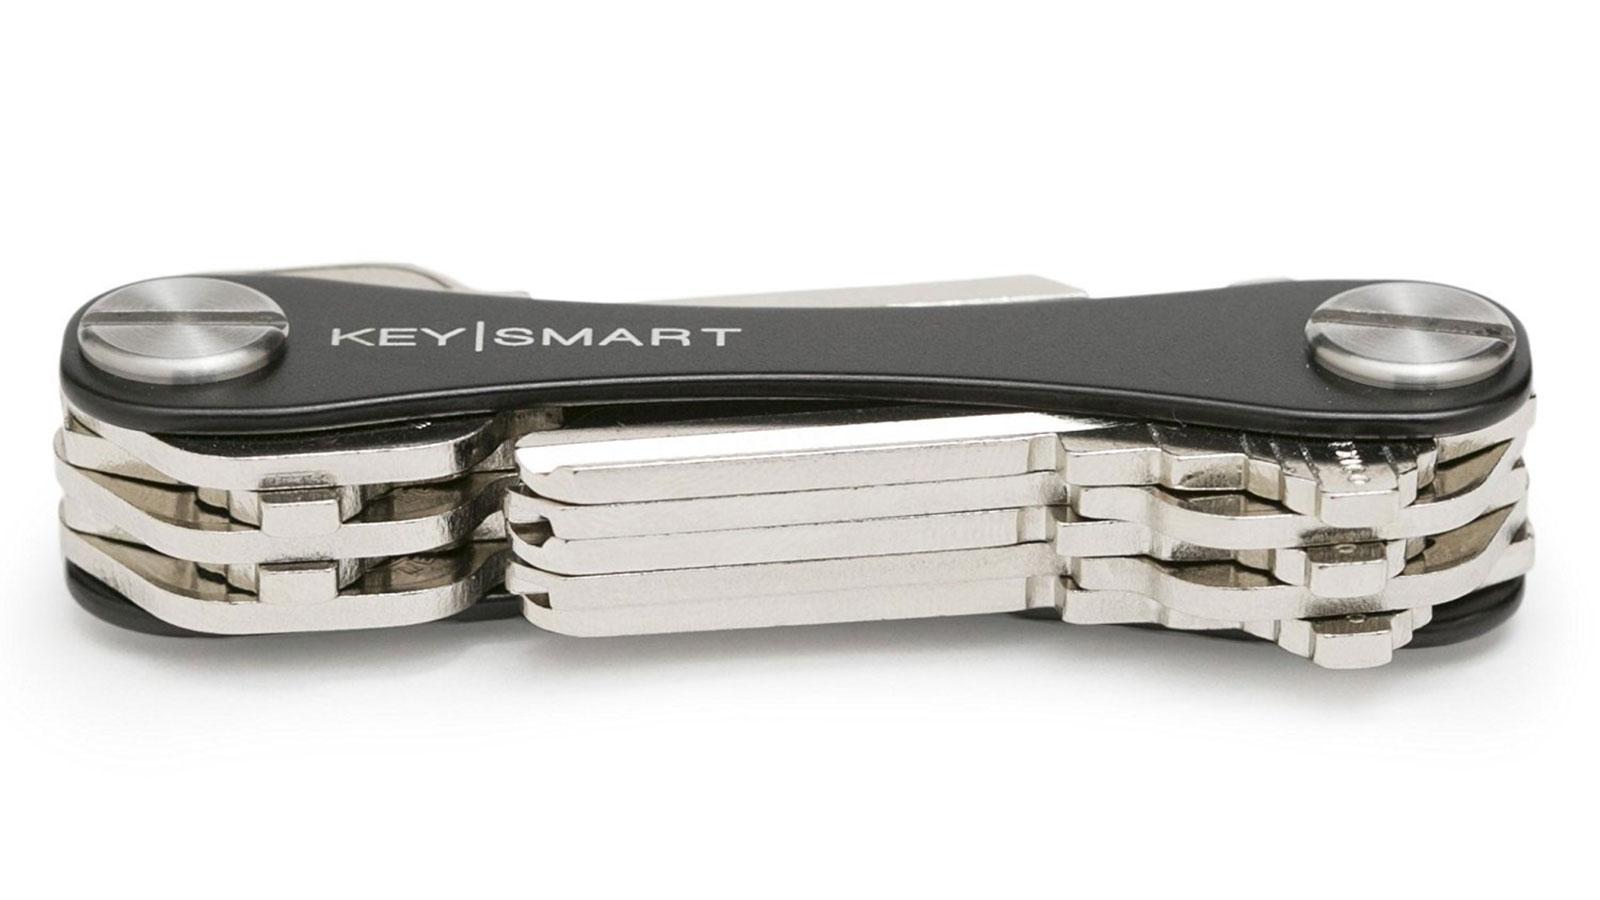 KeySmart Compact EDC Key Organizer | best everyday carry key organizers